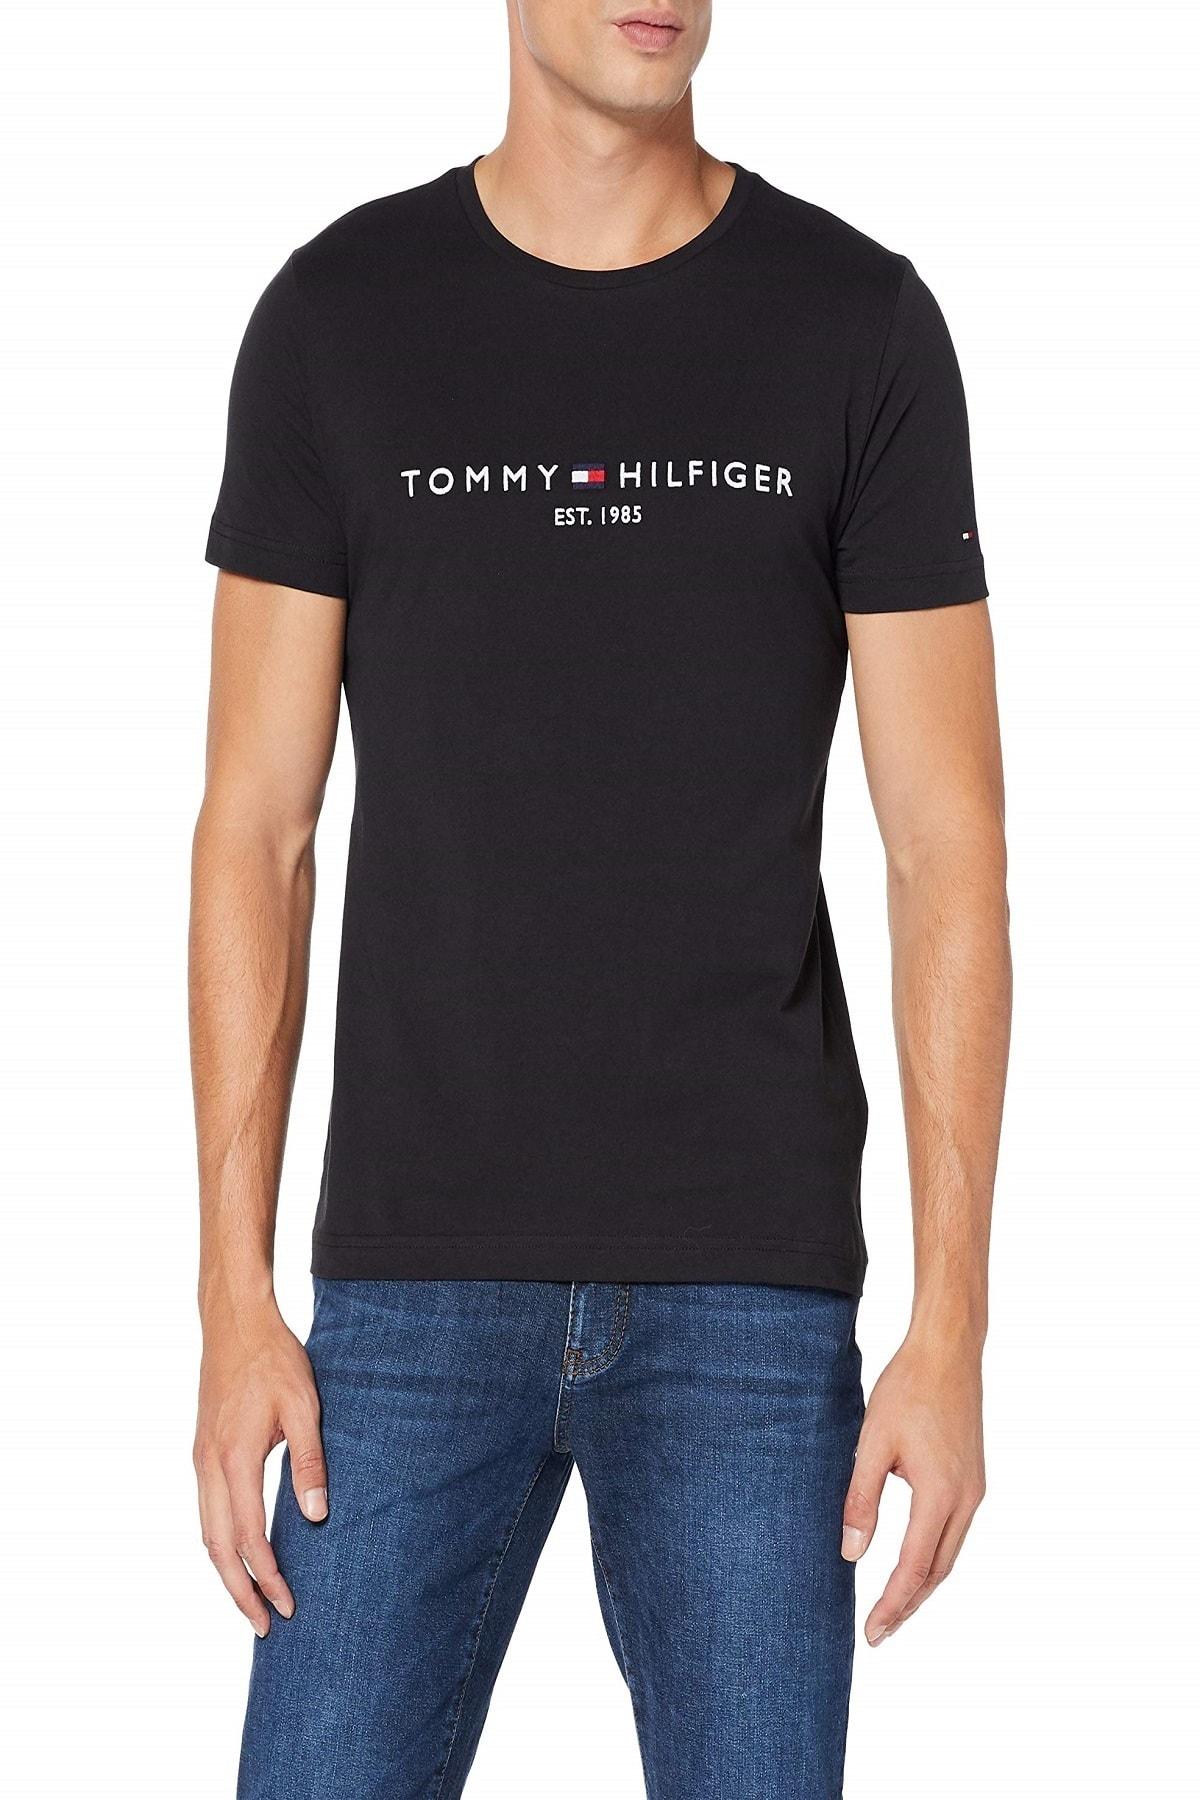 Tommy Hilfiger Erkek Lacivert  Logo Tee T-shirt Mw0mw11797 2